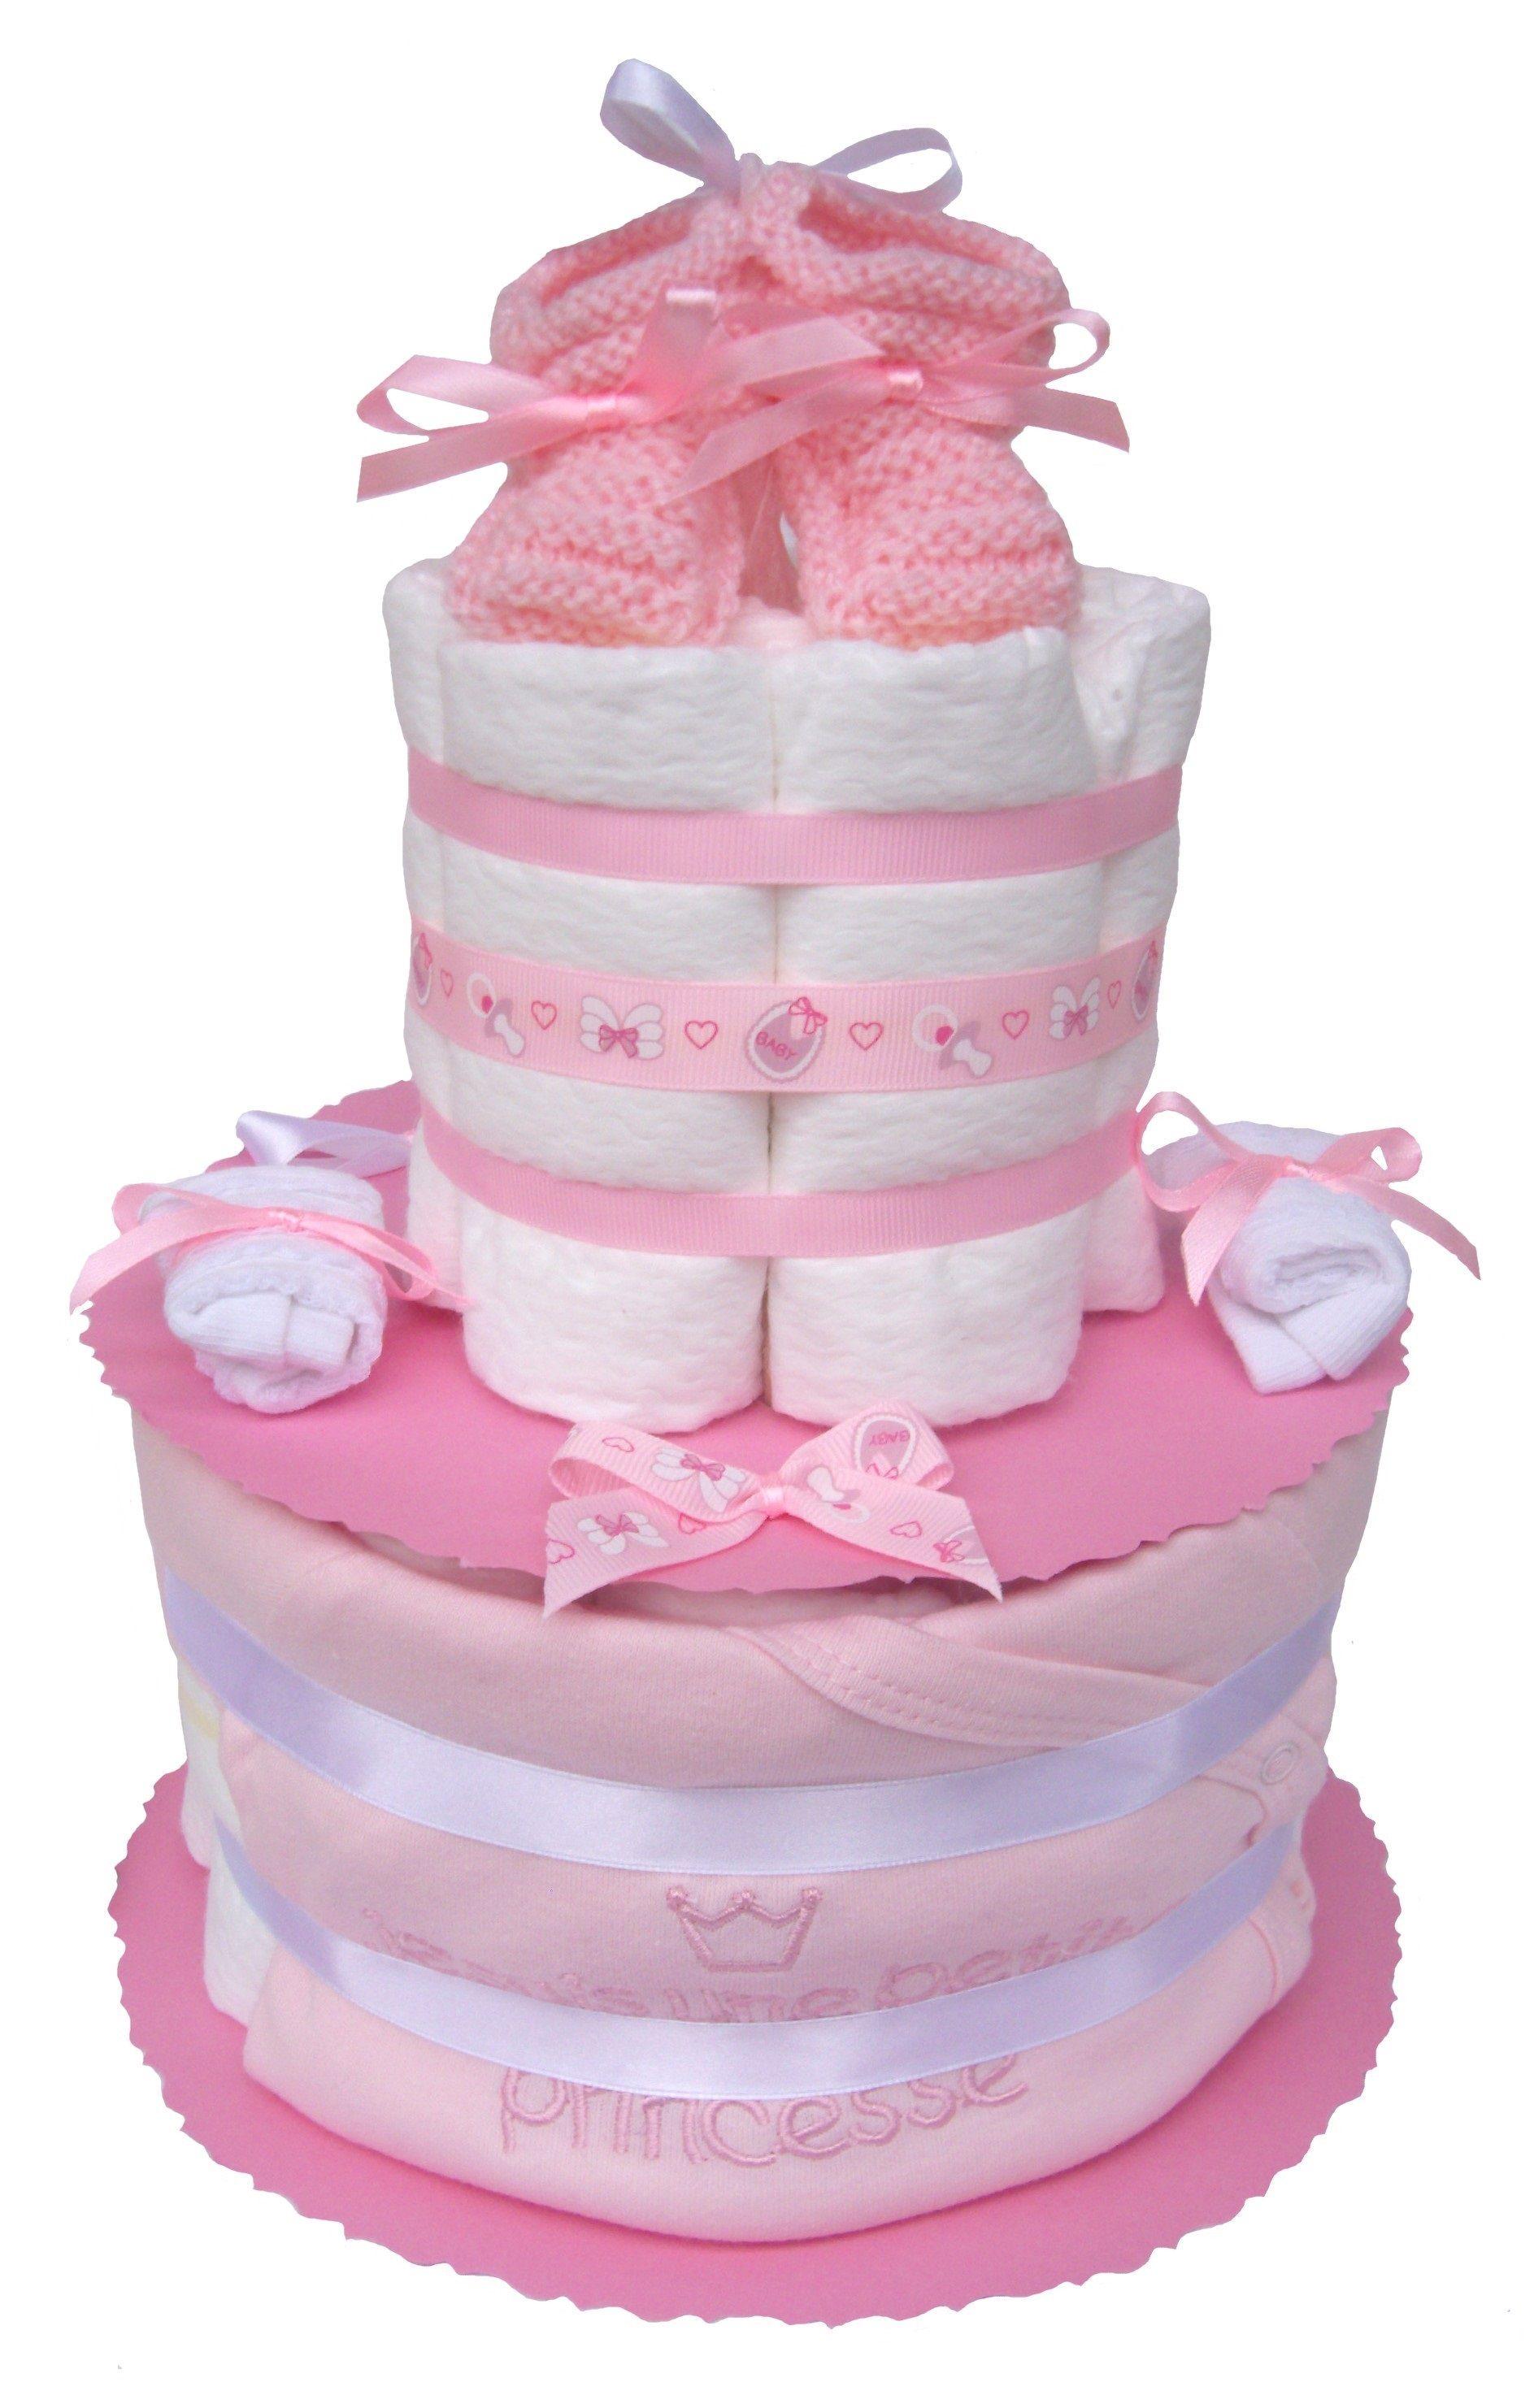 Cadeau pour une petite baby princesse en couches pampers g teau de couches b b fille pamper - Couches pampers naissance ...